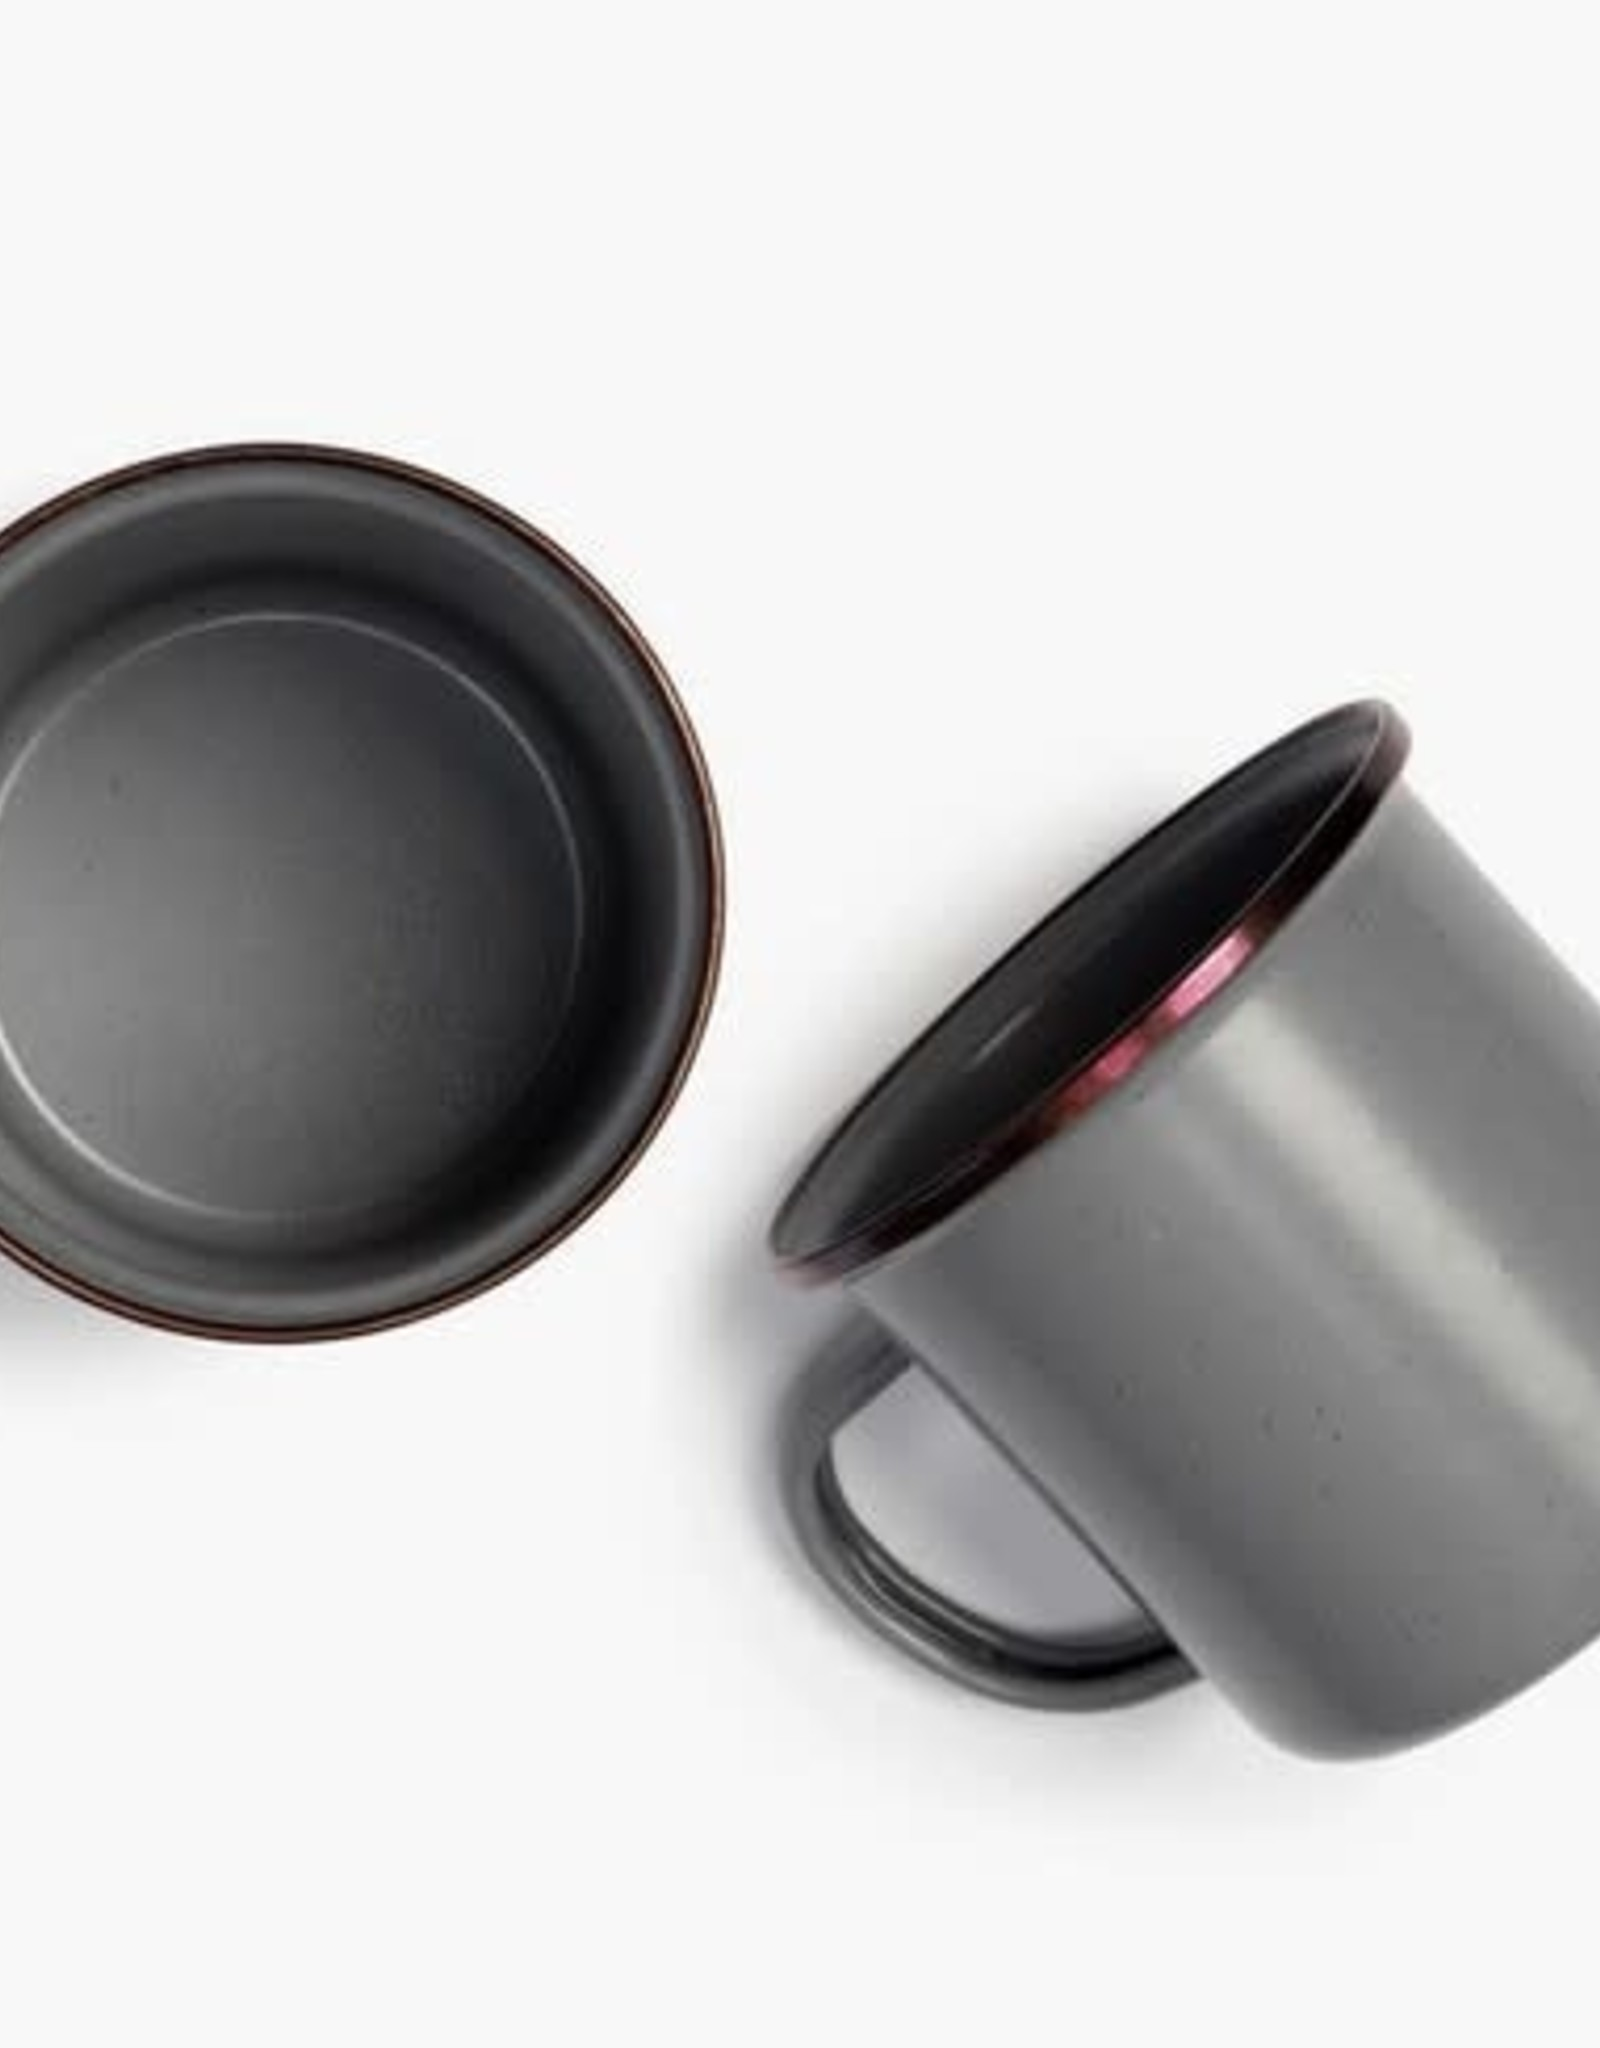 Barebones Living Cups, Enamel set/2